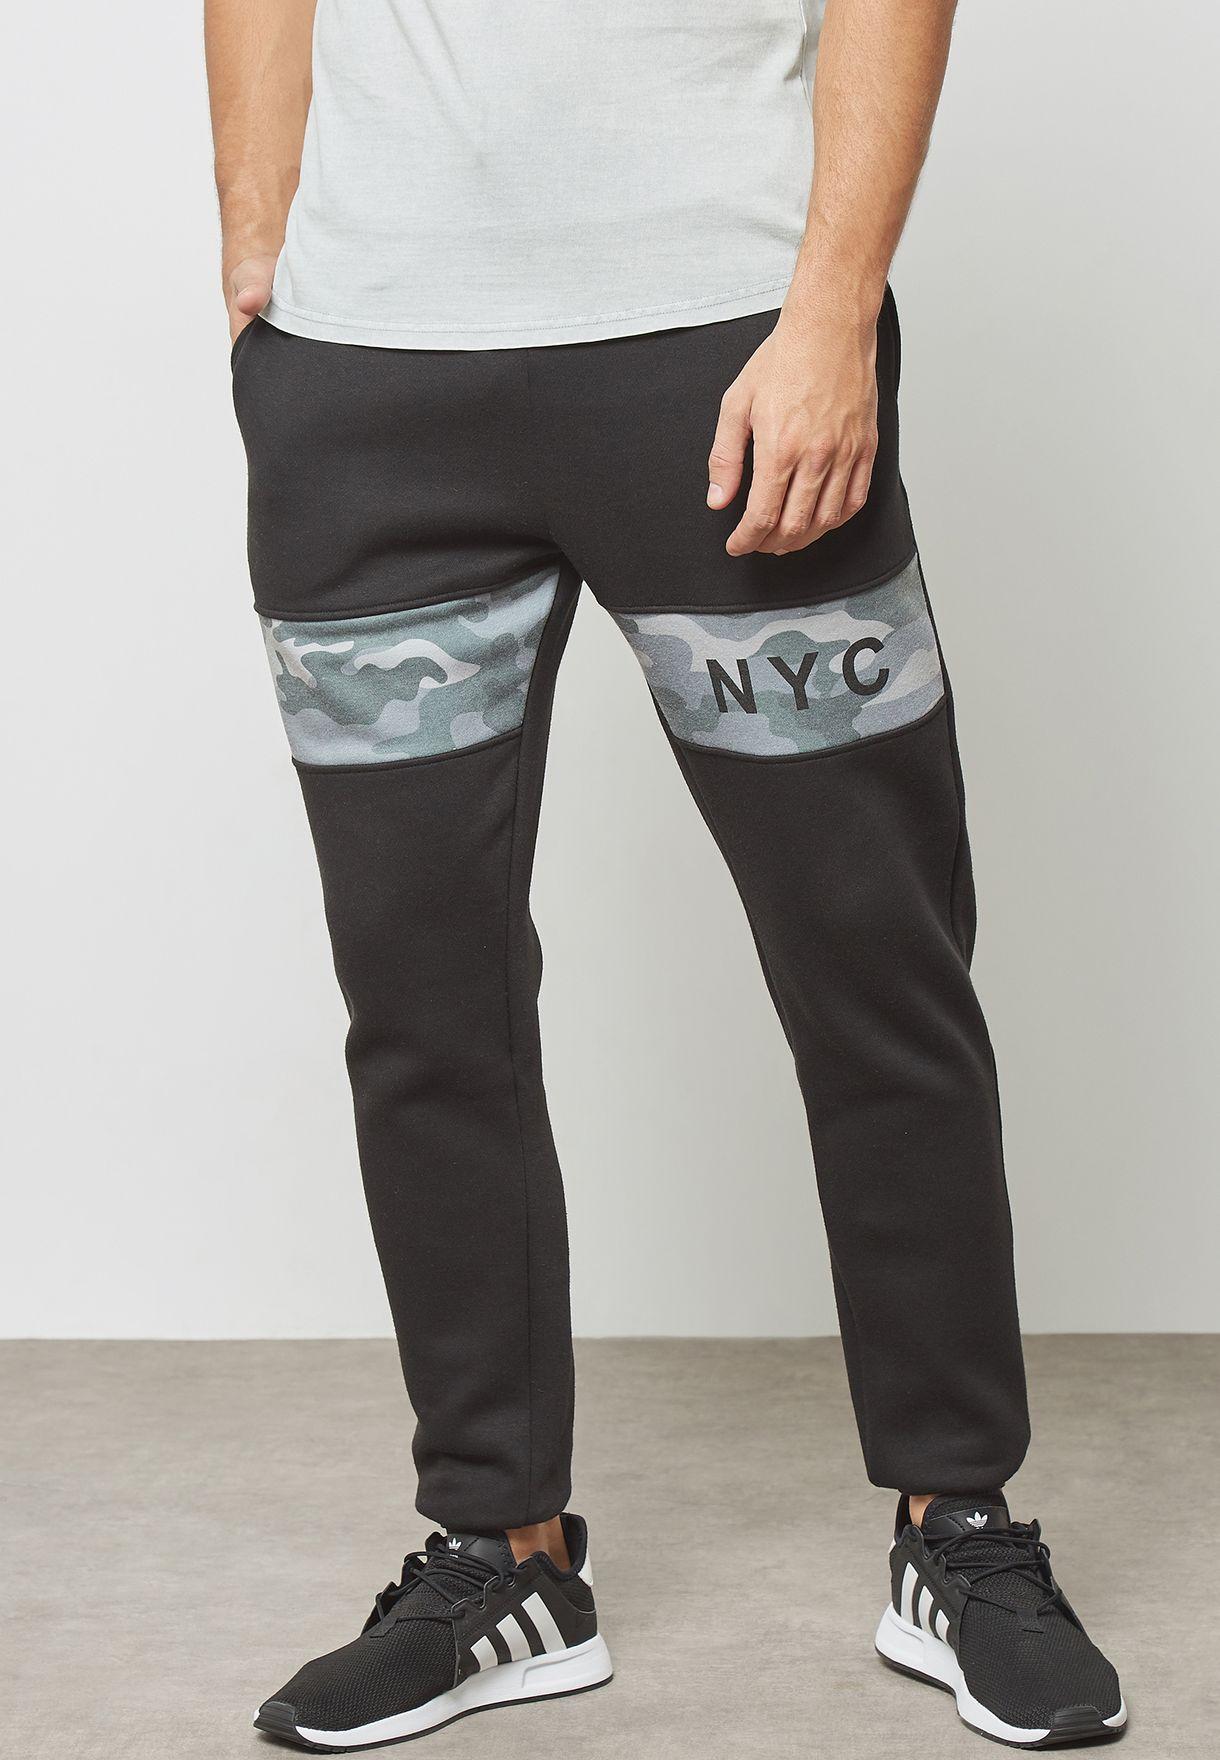 NYC Cuffed Sweatpants